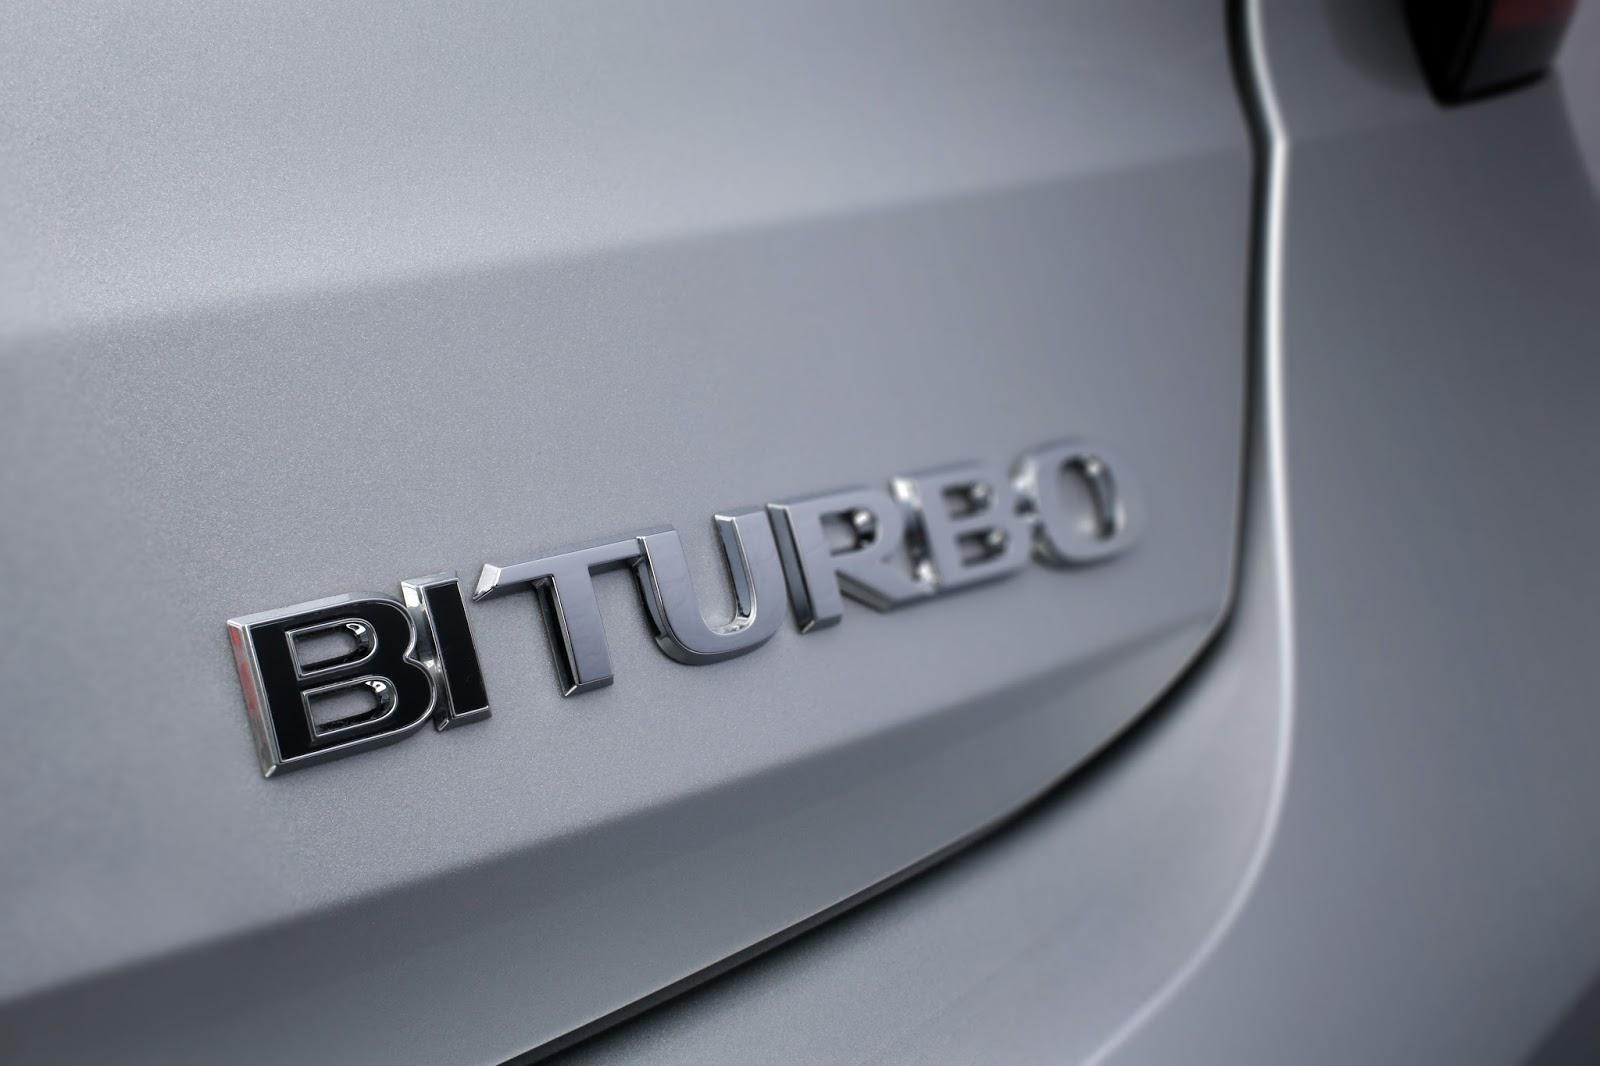 Opel Astra BiTurbo 5 door 301331 Το καυτό Opel Astra BiTurbo diesel συνδυάζει τις επιδόσεις με την οικονομία! Hatchback, Opel, Opel Astra, Opel Astra BiTurbo, Opel Astra BiTurbo Hatchback, twin-turbo